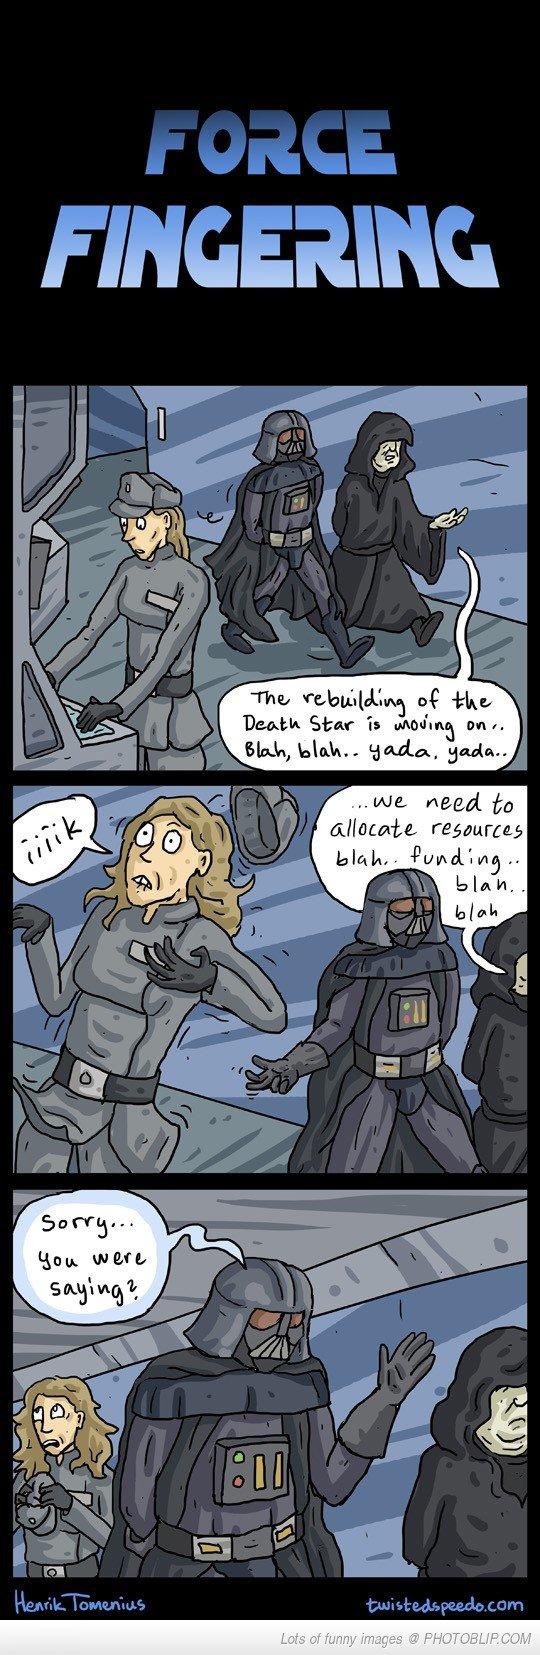 Force fingering. .. hmmm the dark side has it's benefits.